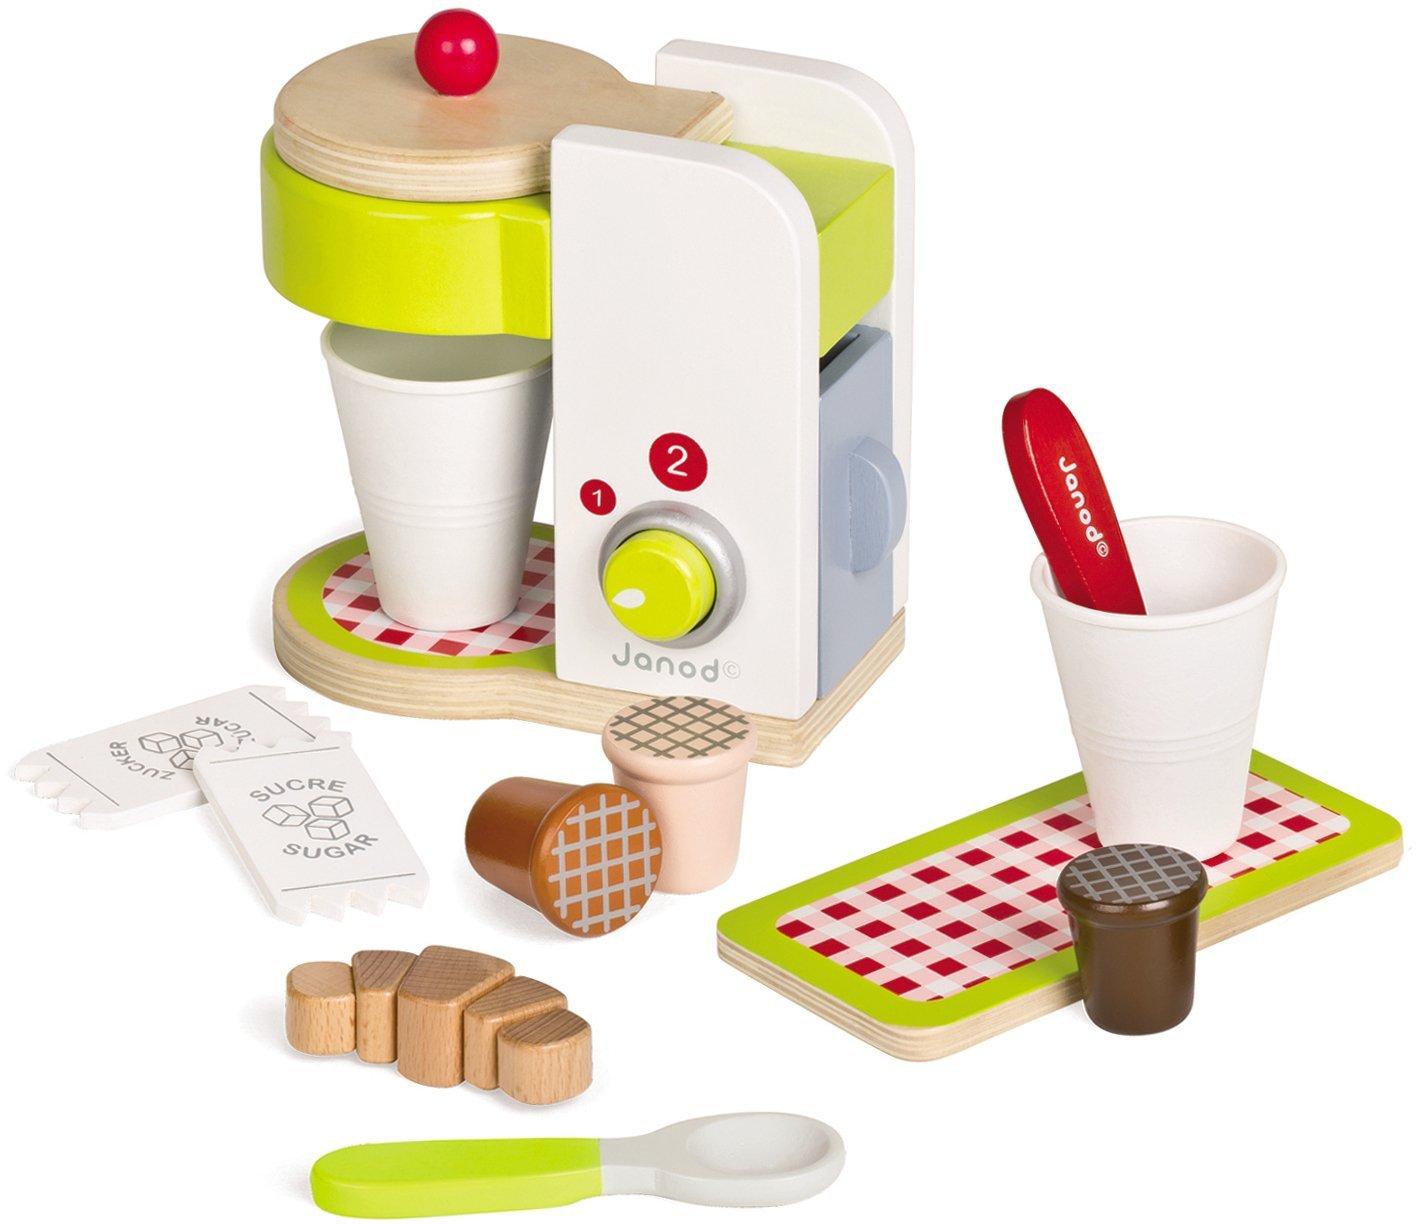 kinder kaffeemaschine beste modelle kinderk chekaufen. Black Bedroom Furniture Sets. Home Design Ideas